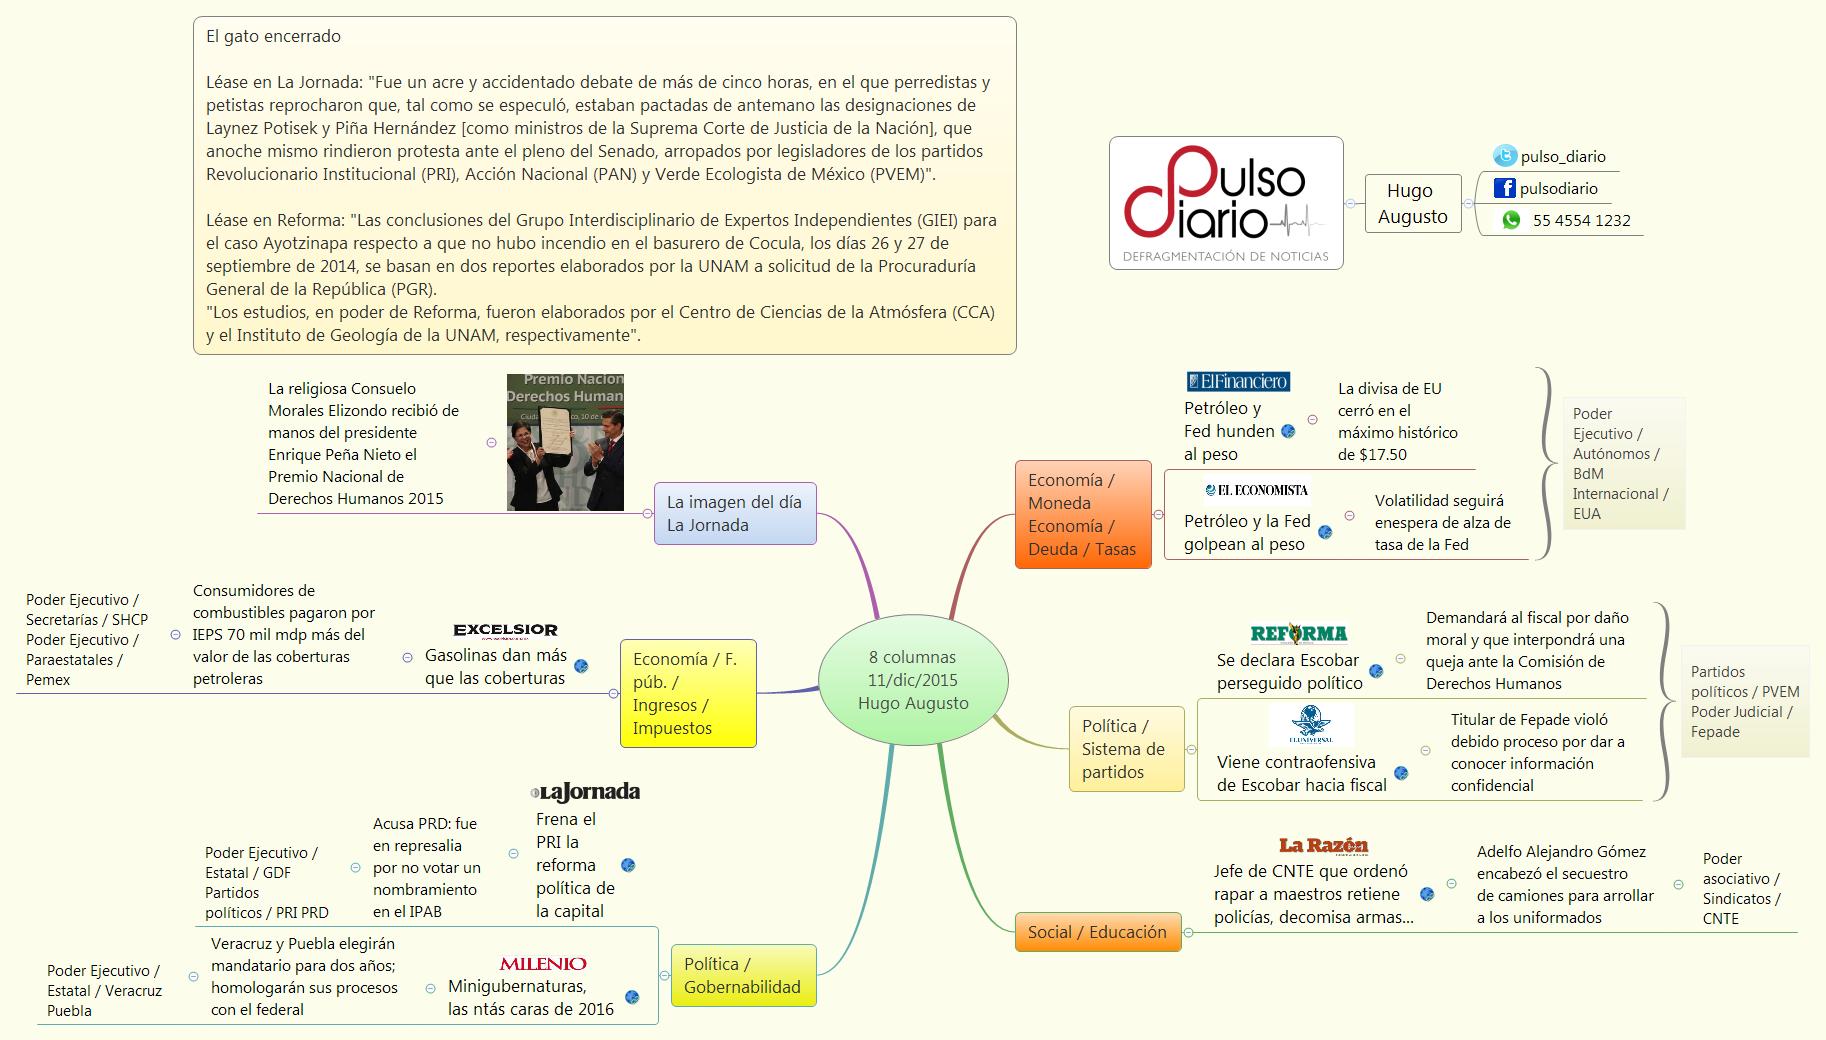 8 columnas 11/dic/2015 Hugo Augusto - Hugo_Augusto - XMind: The Most ...